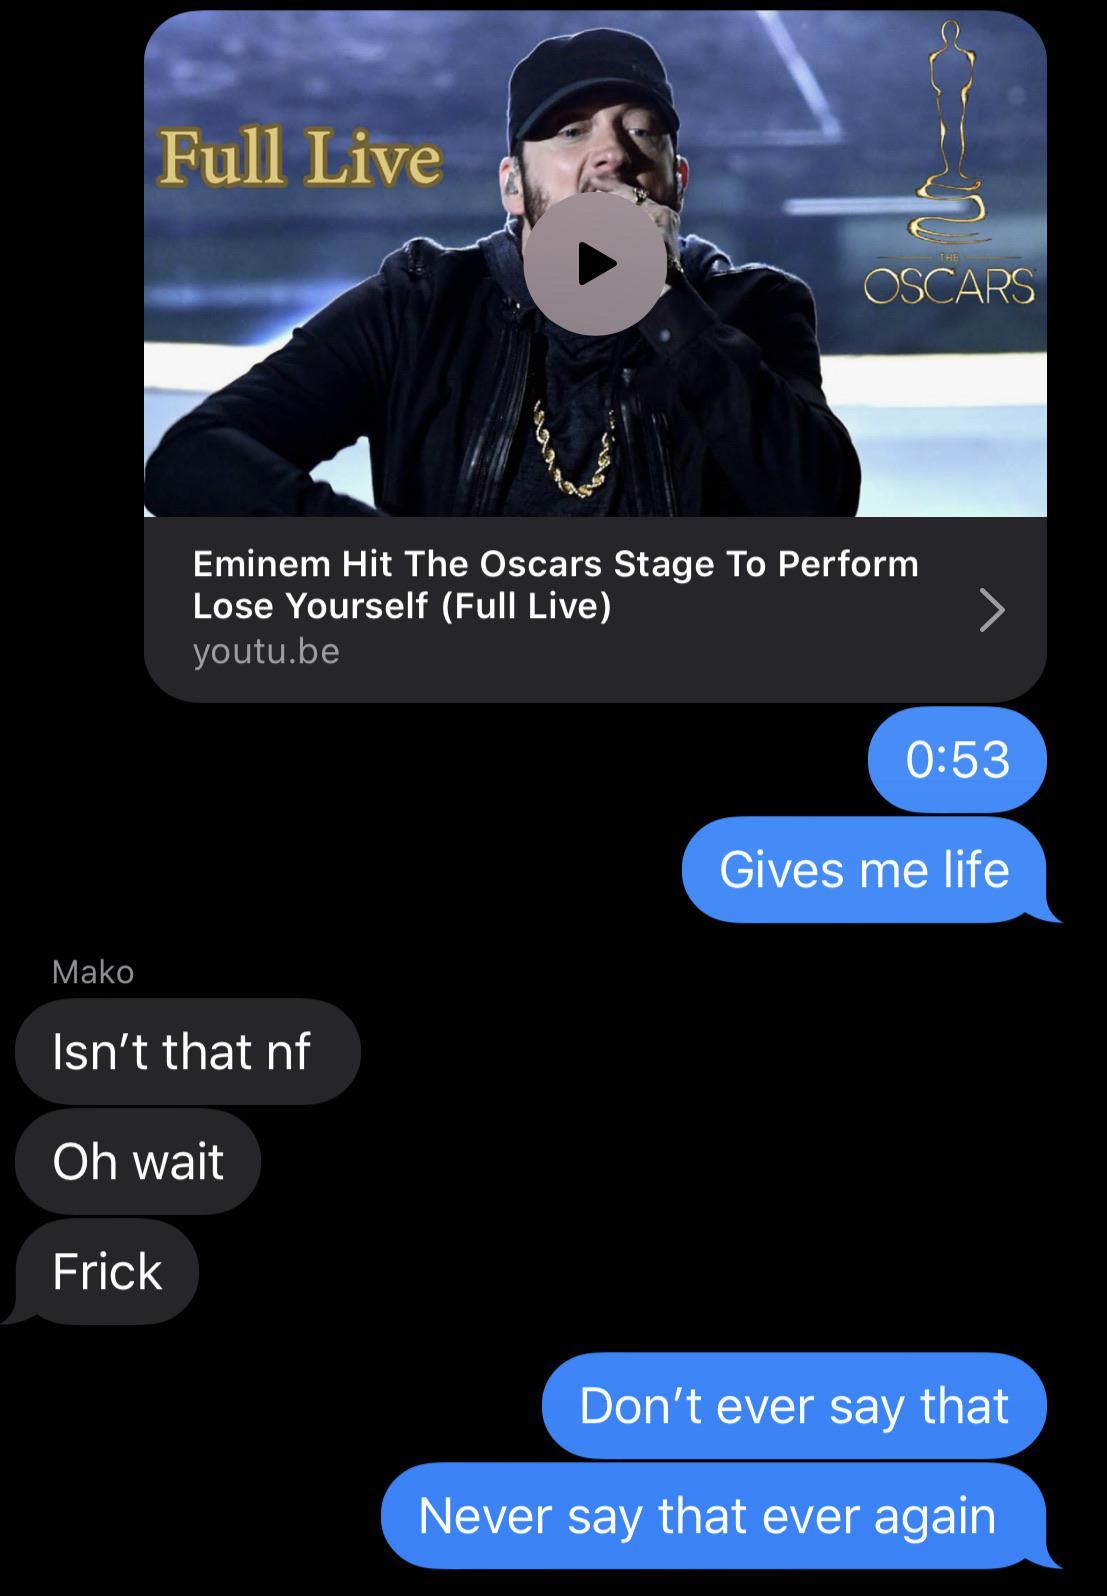 Eminem Vs Nf : eminem, Eminem